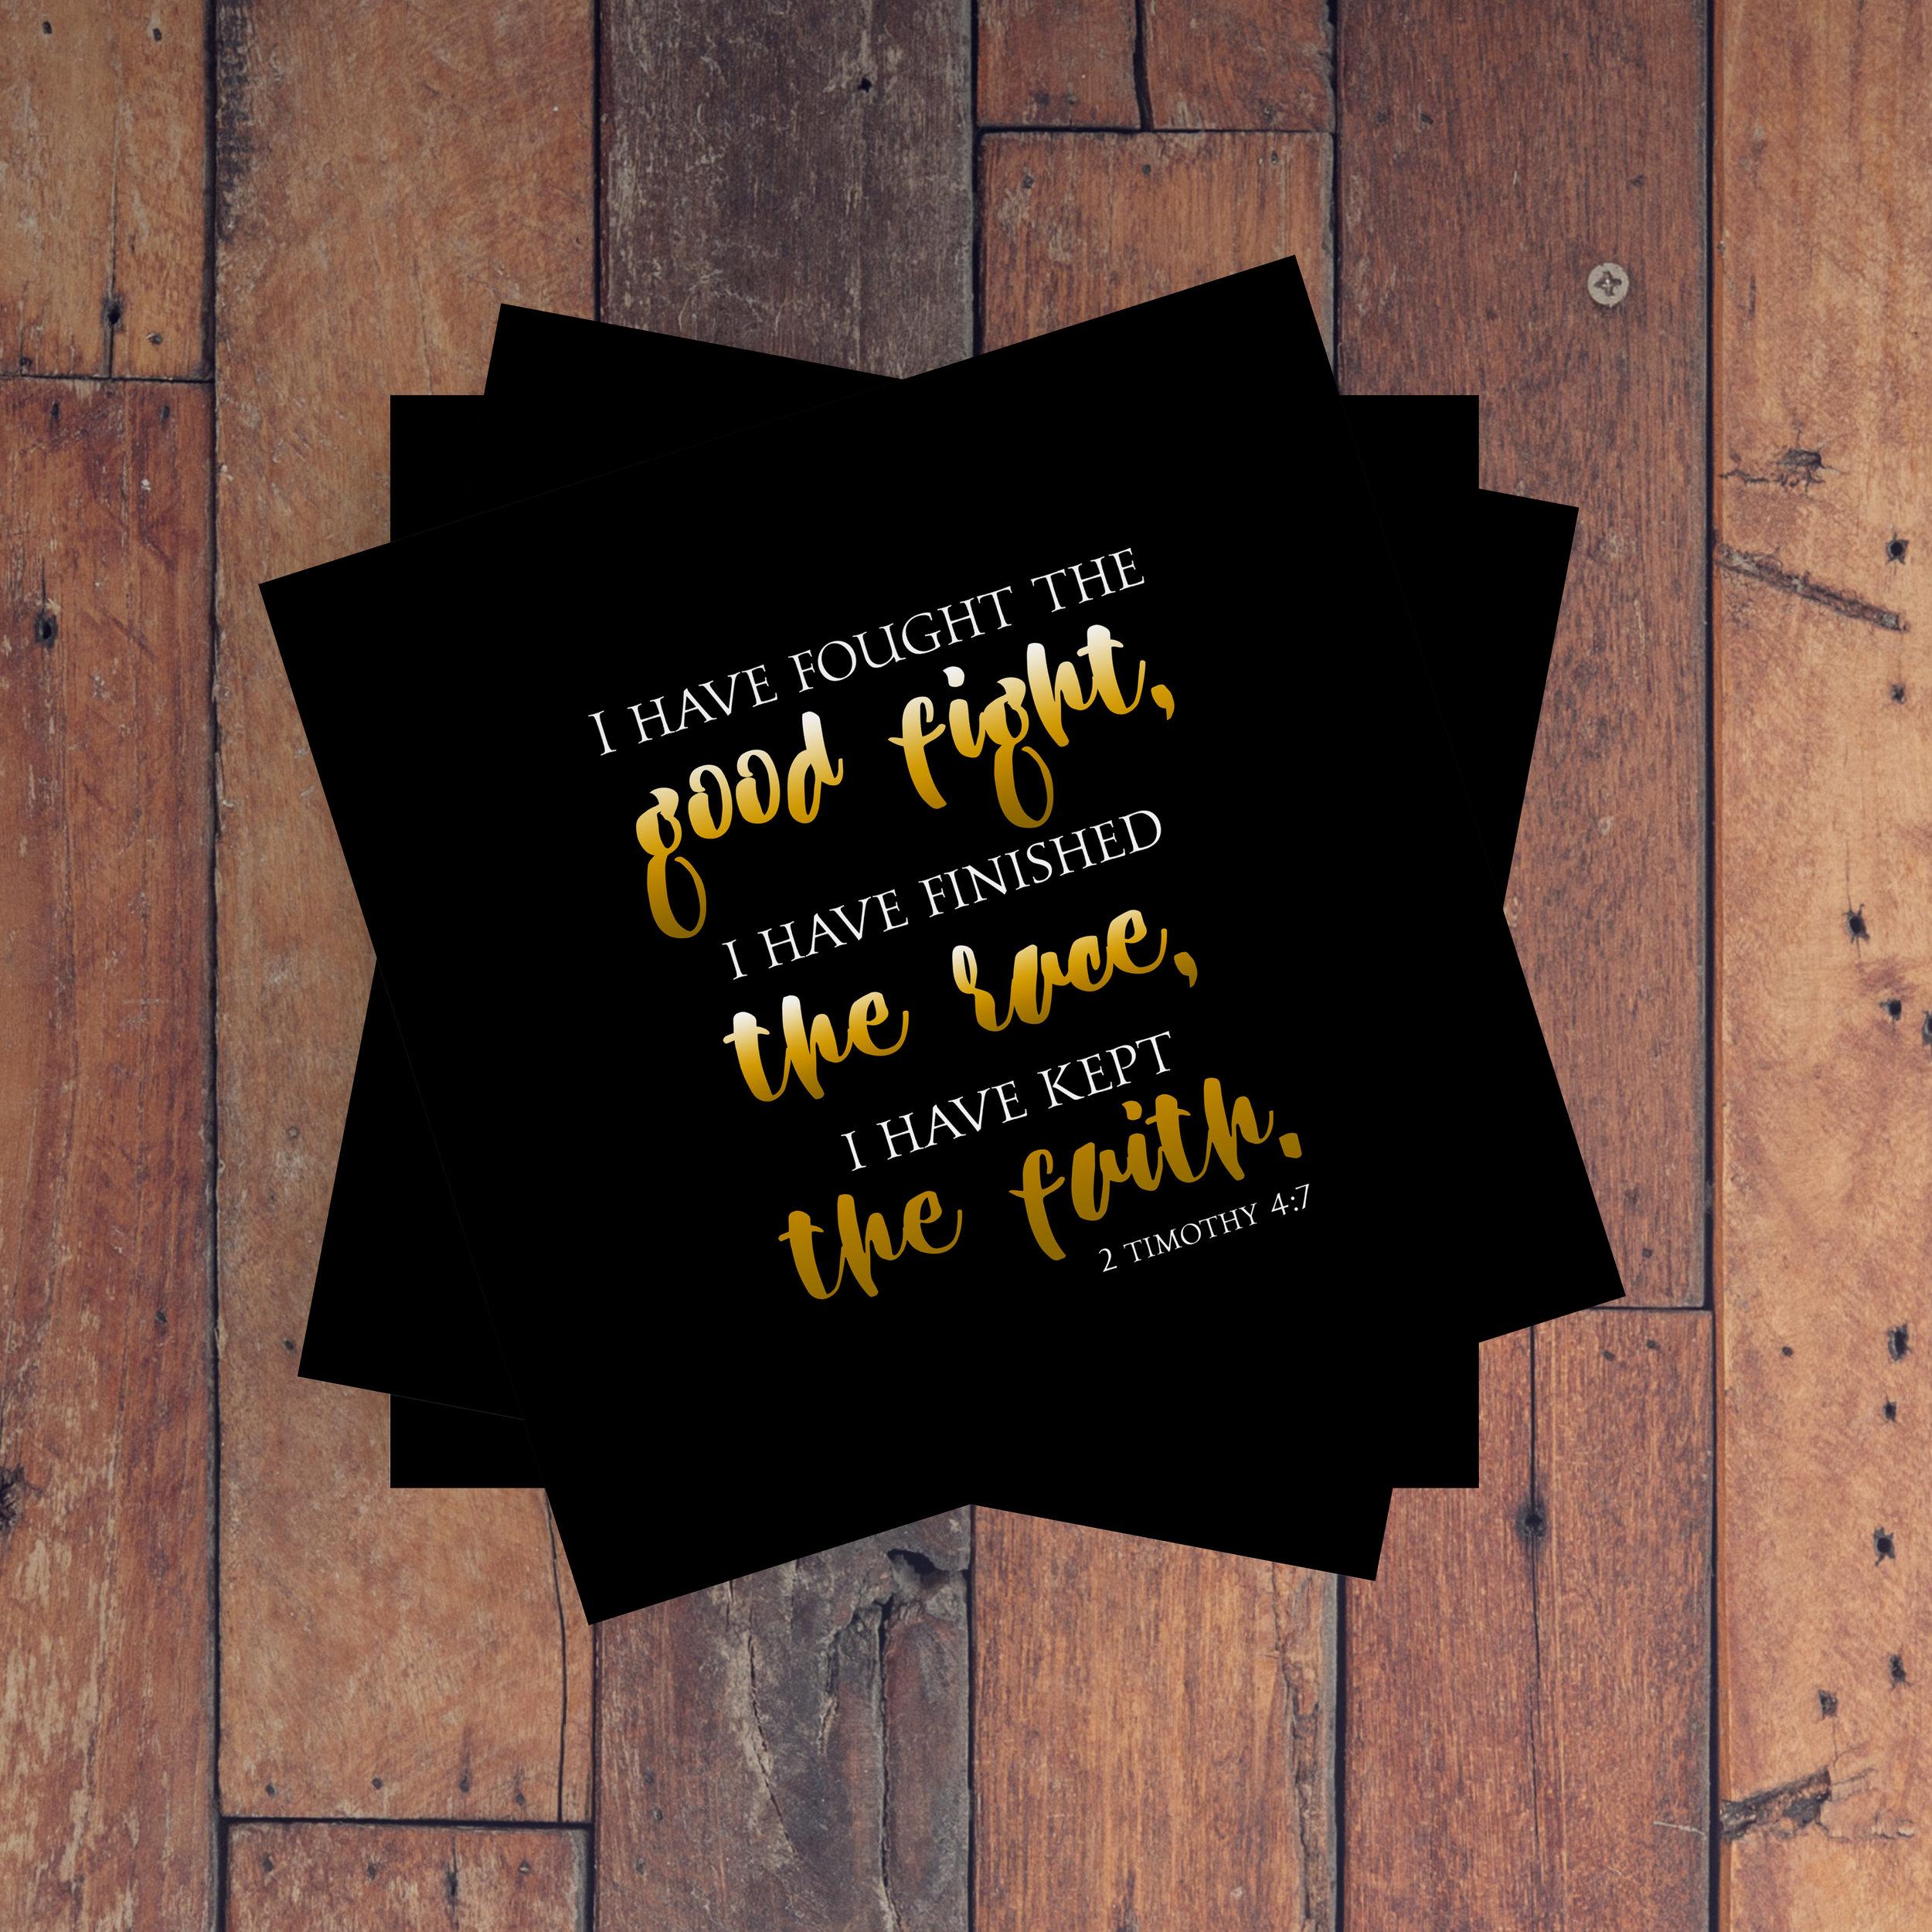 2 Timothy 4:7 Wood Wall Art